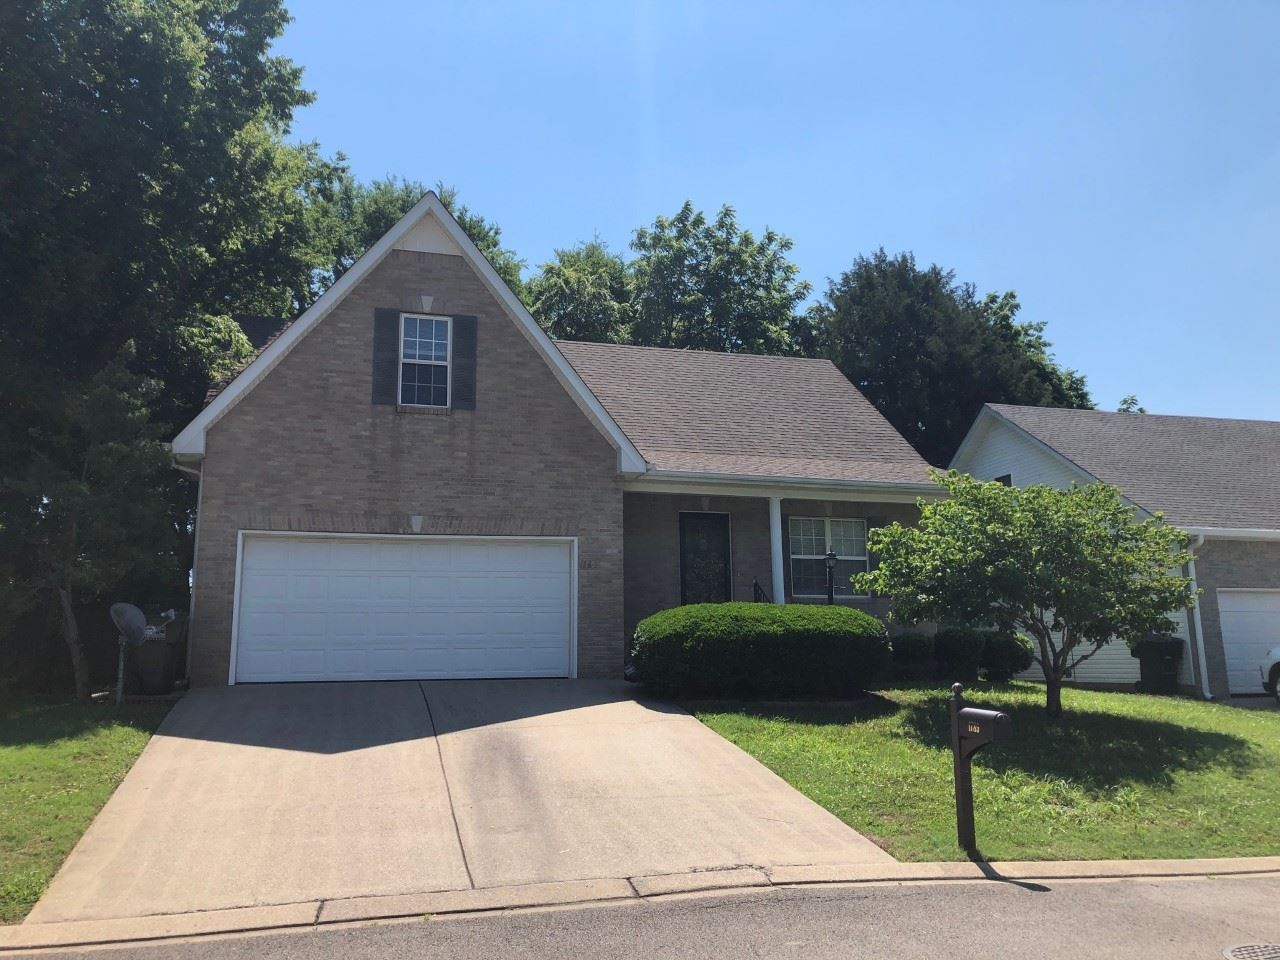 1789 North Cove, Murfreesboro, TN 37129 - MLS#: 2263542